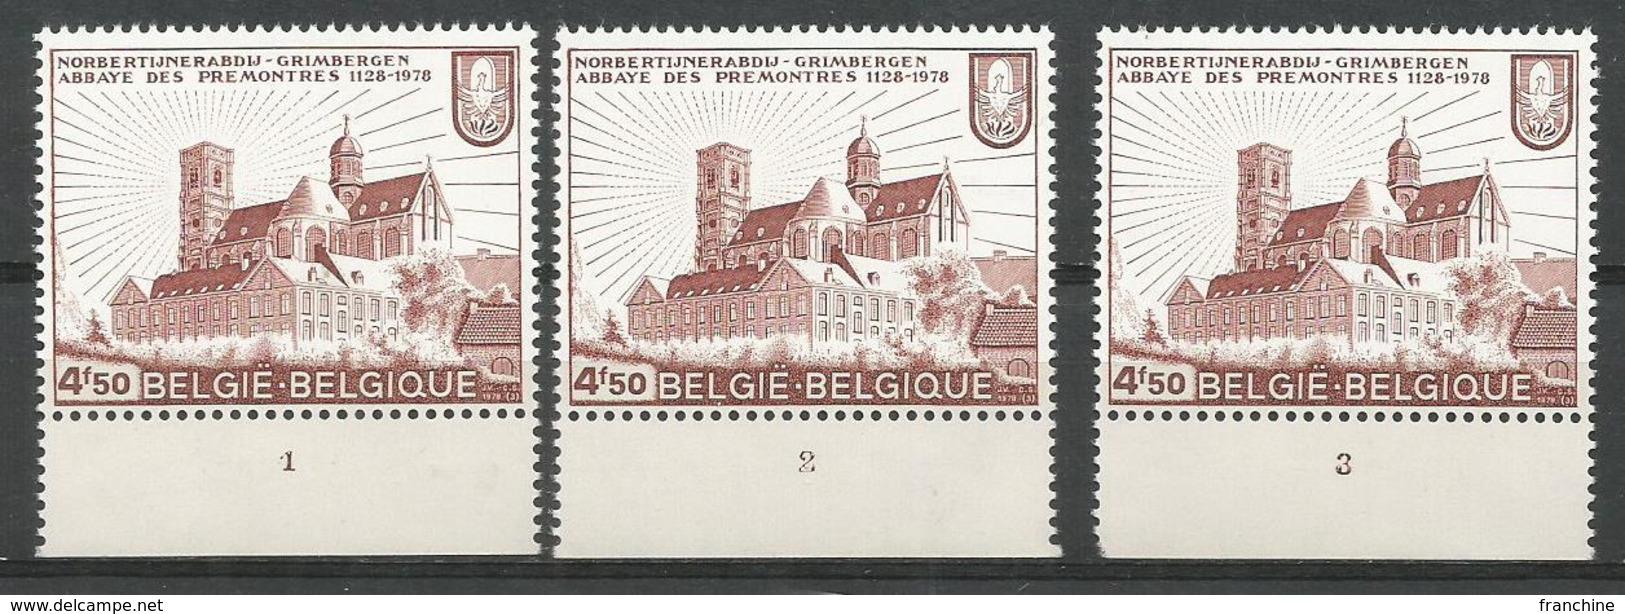 1978 - COB N° 1888 - Planche 1-2-3 ** (MNH) - Plaatnummers